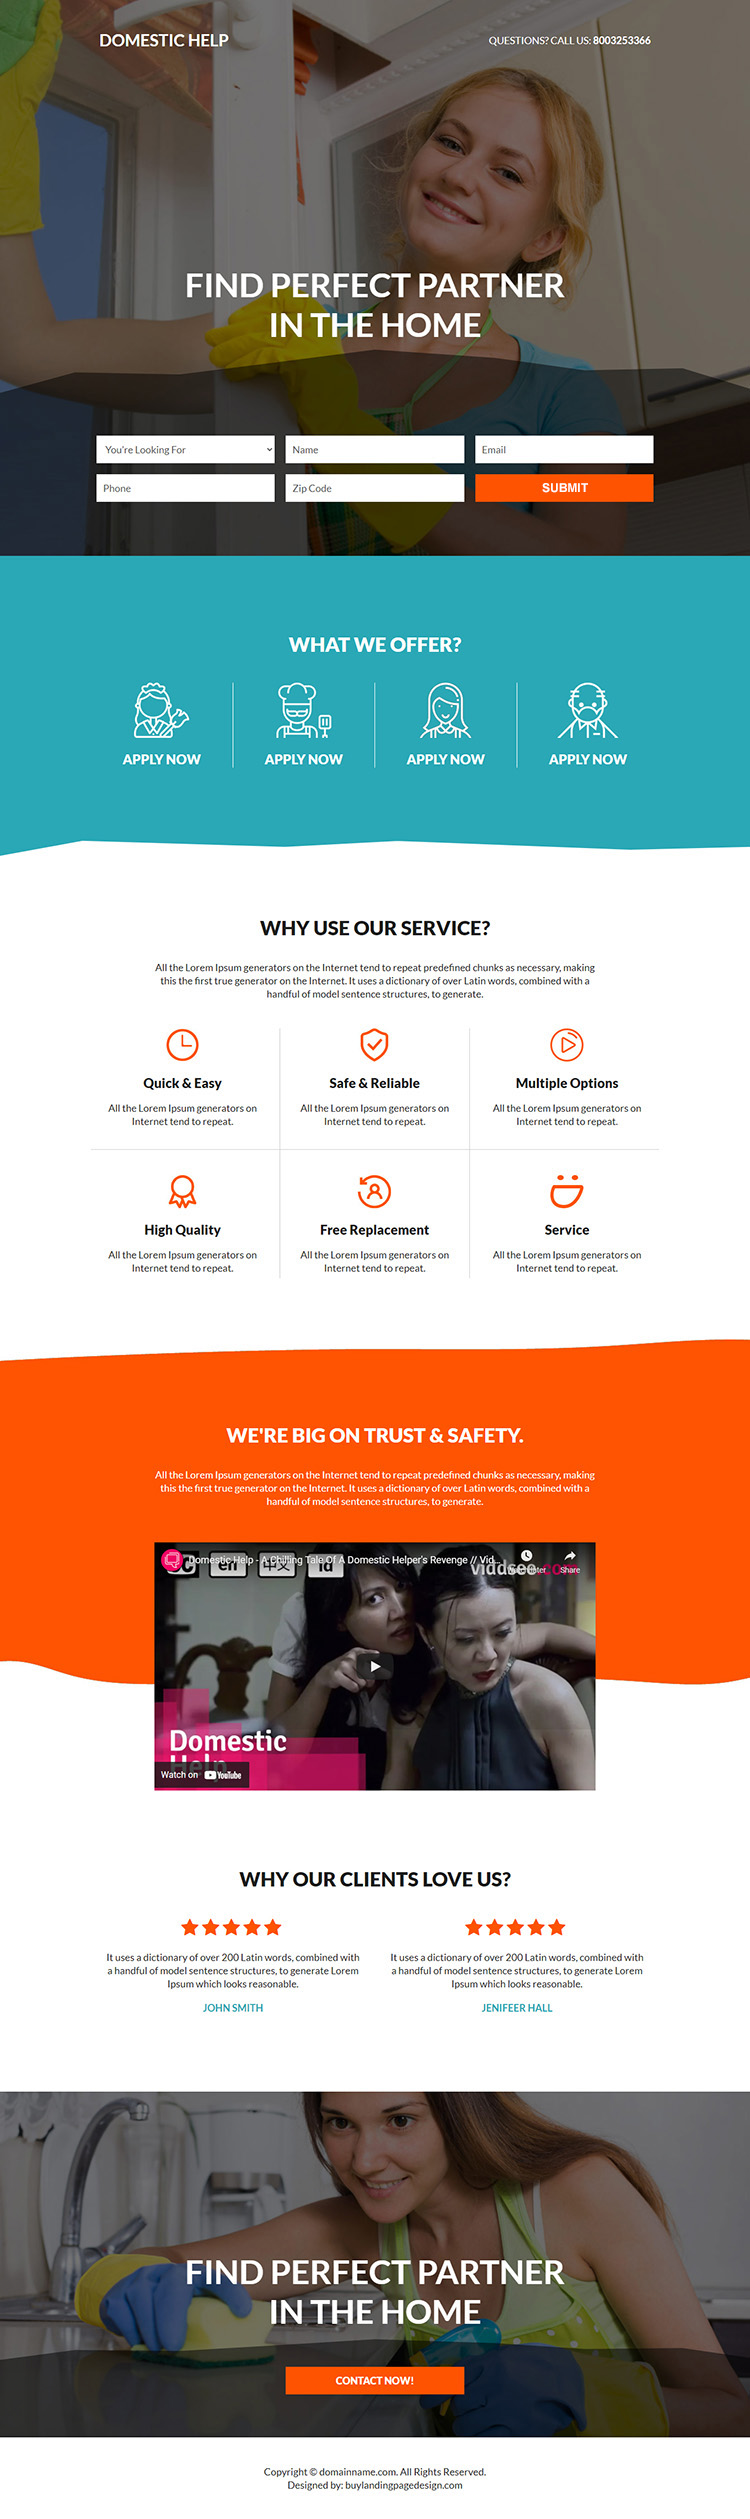 best domestic help service responsive landing page design